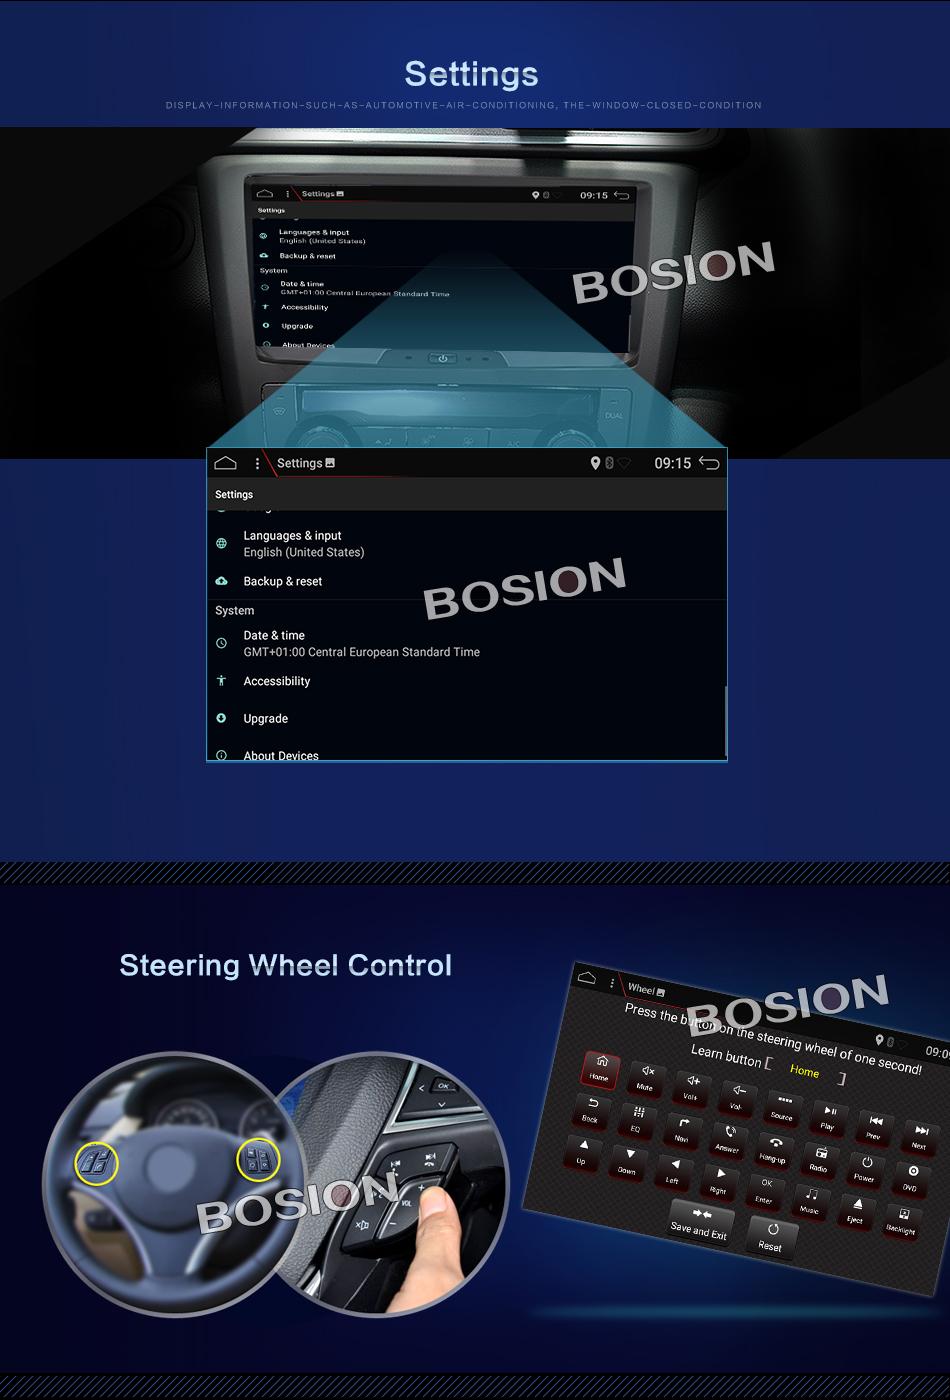 HTB1ndnQXtjvK1RjSspiq6AEqXXau - Quad Core Pure Android 7.1 GPS Navigator Radio car dvd For Dacia Renault Duster Logan Sandero stereo Central Cassette Player